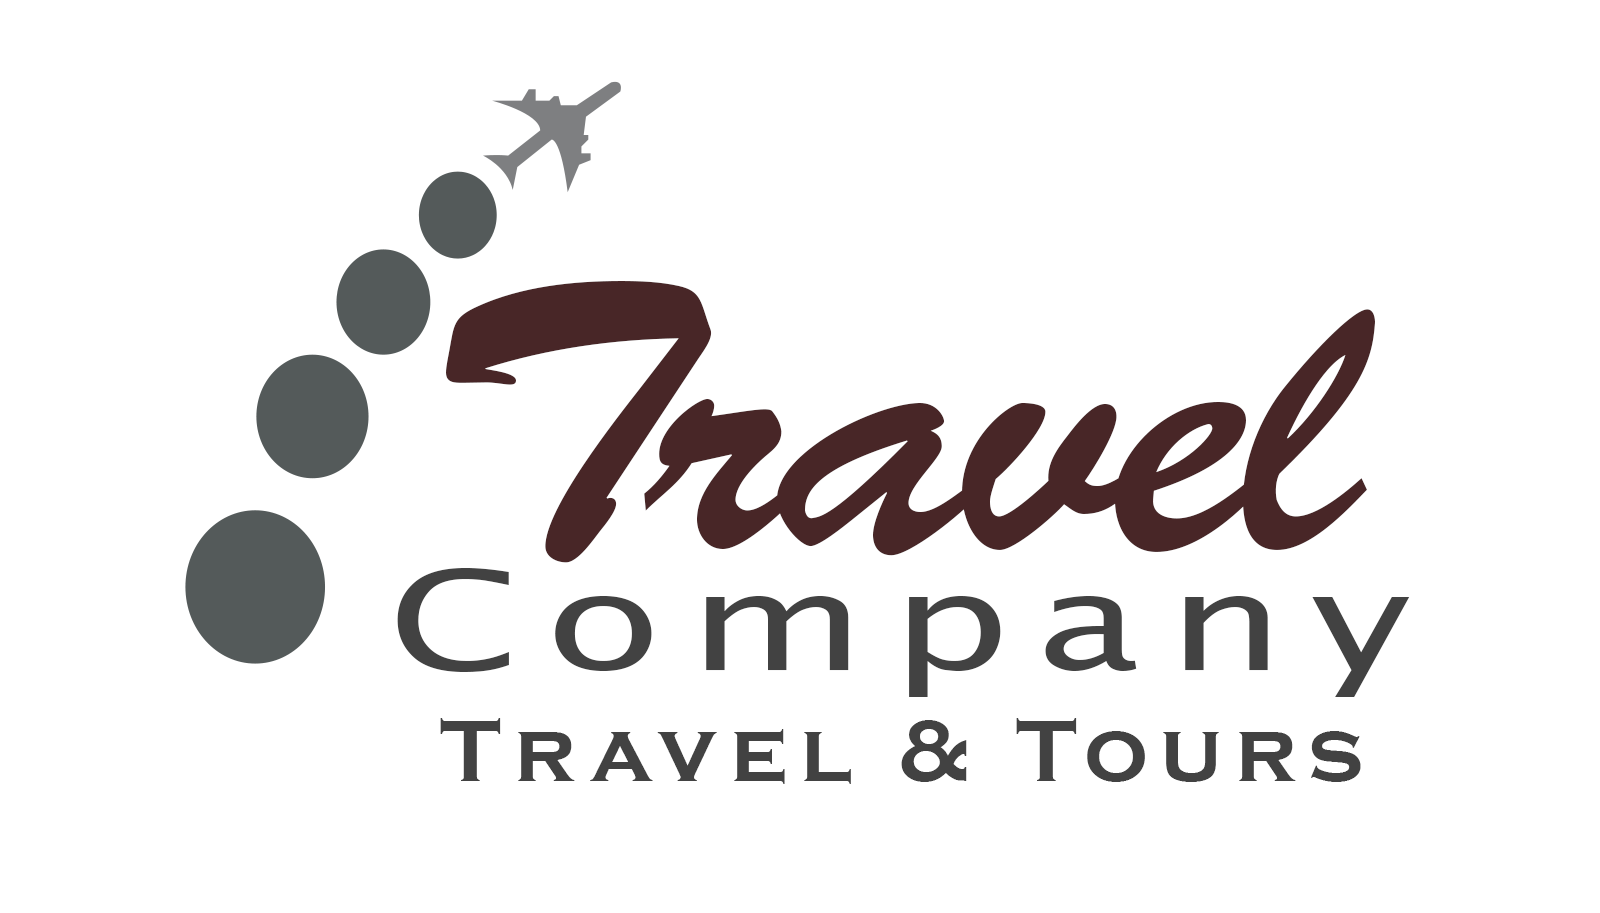 Travel-Company-Tours-&-Travels-Logo